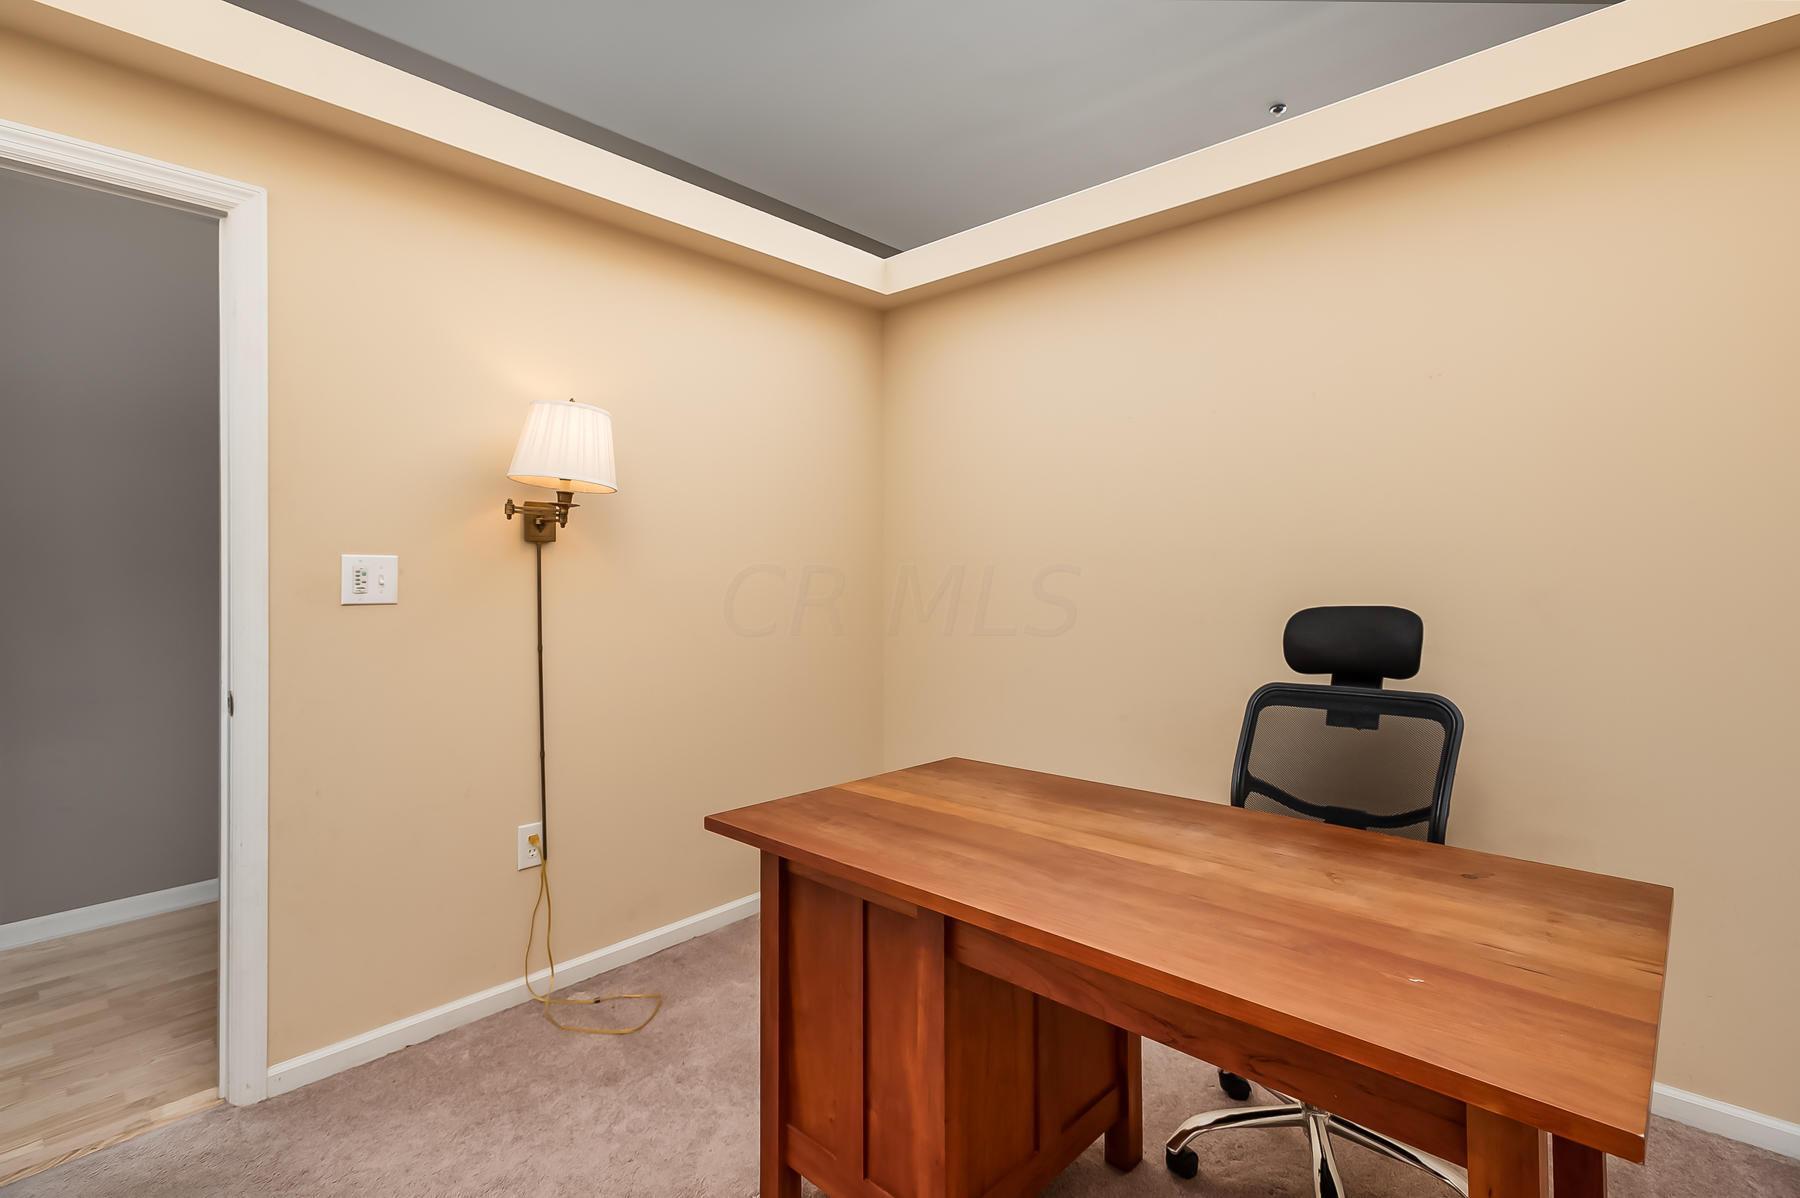 78 Chestnut Street, Columbus, Ohio 43215, 2 Bedrooms Bedrooms, ,2 BathroomsBathrooms,Residential,For Sale,Chestnut,220018967